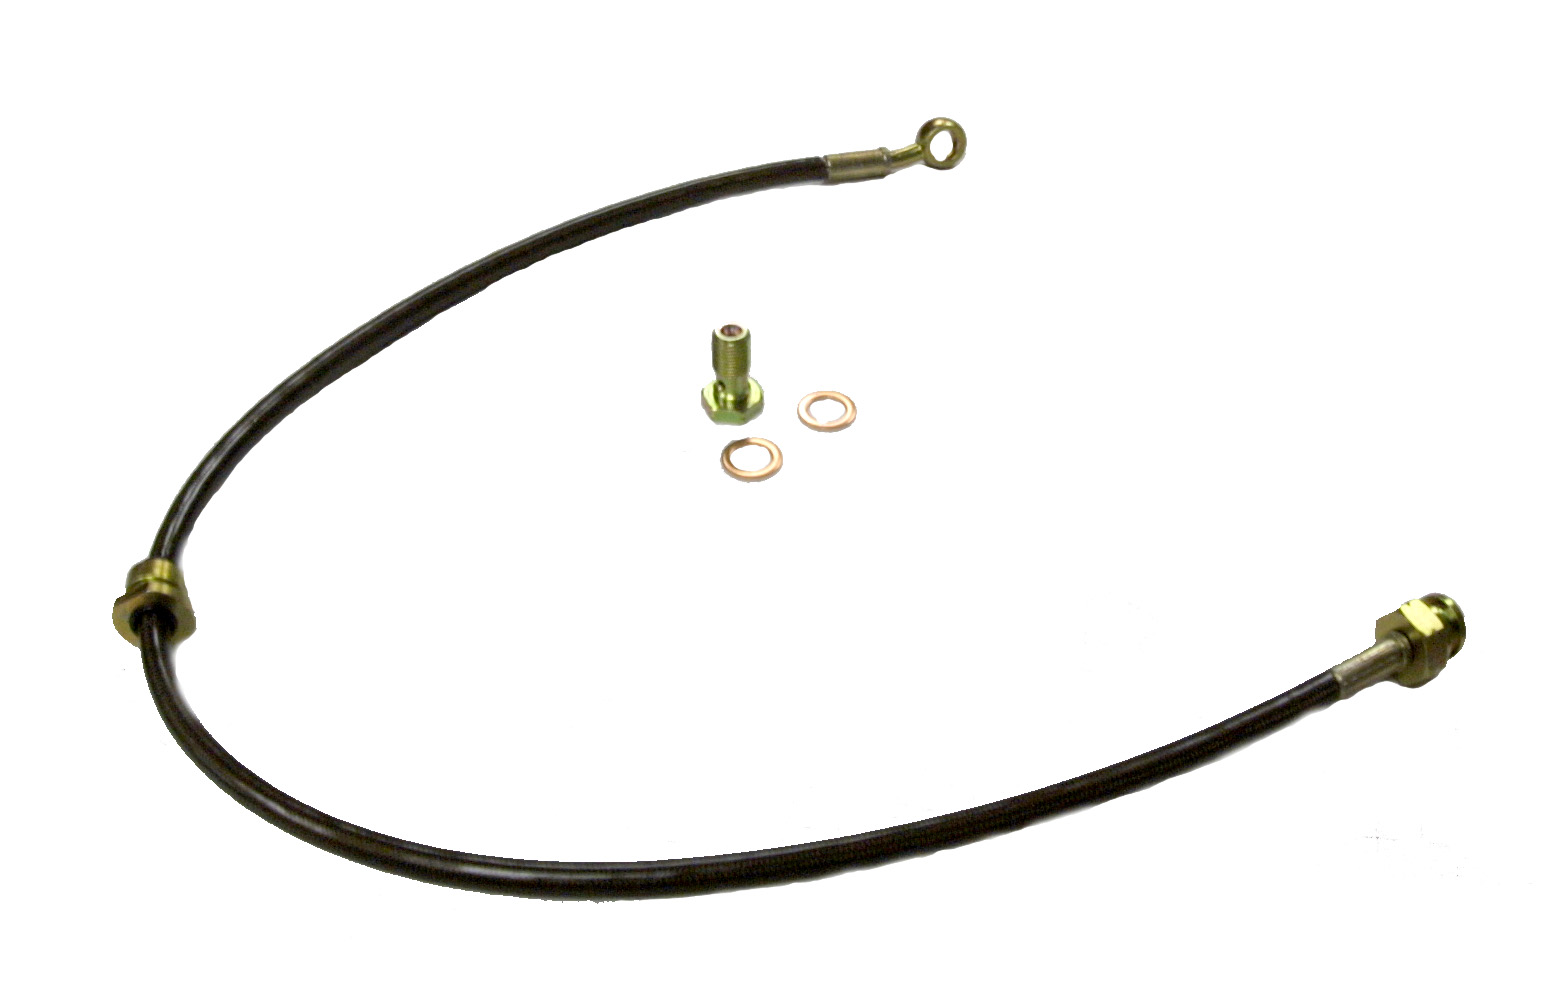 Agency Power Steel Braided Clutch Line Mazda RX-8 04-11 - AP-RX8-400